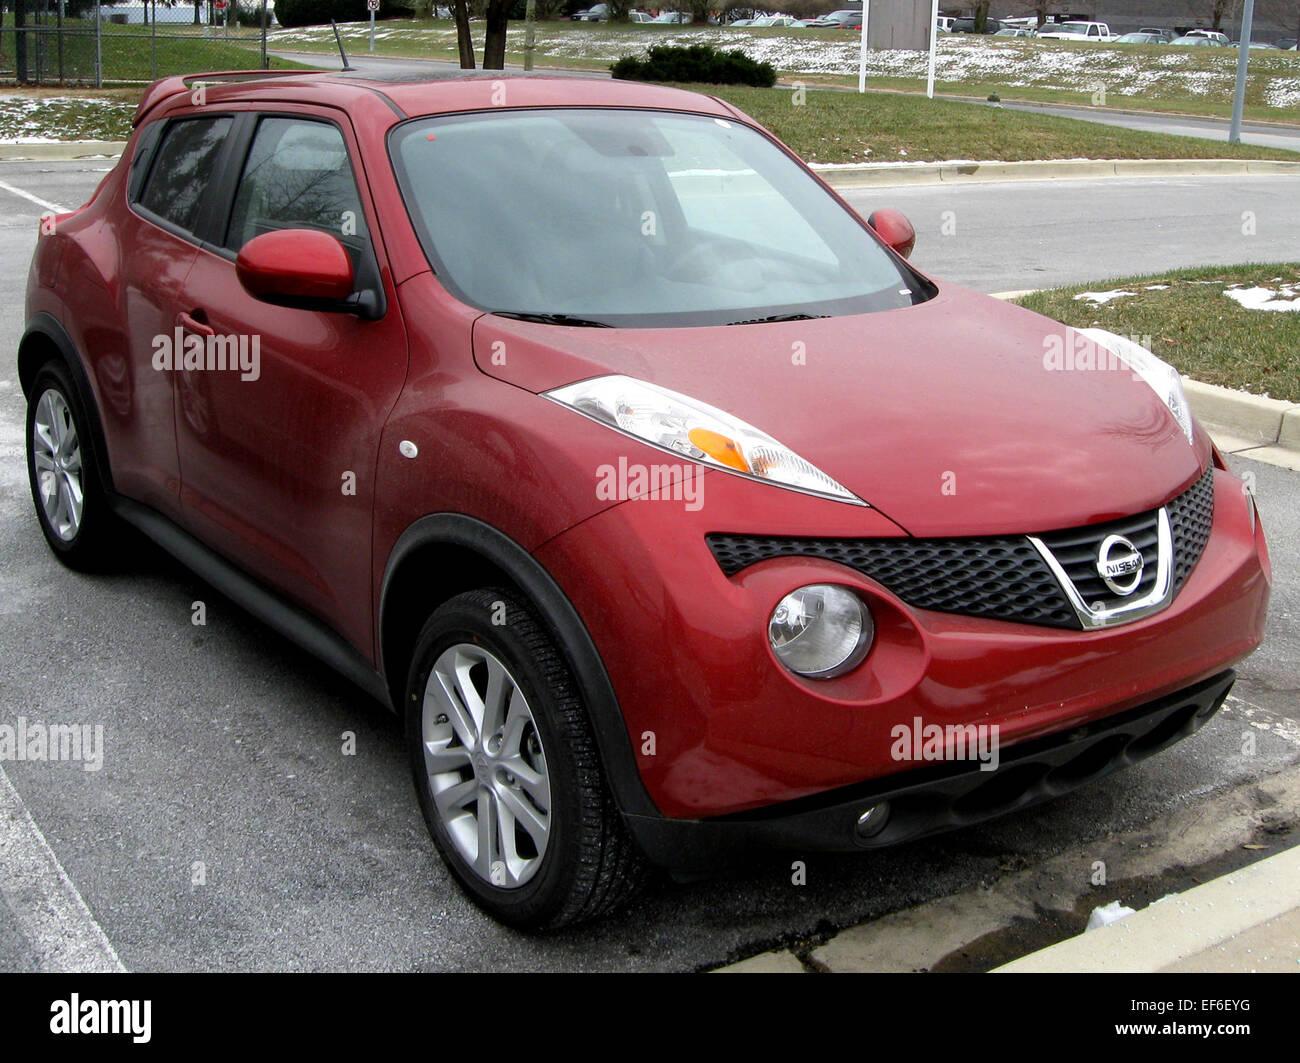 2011 Nissan Juke 12 22 2010   Stock Image